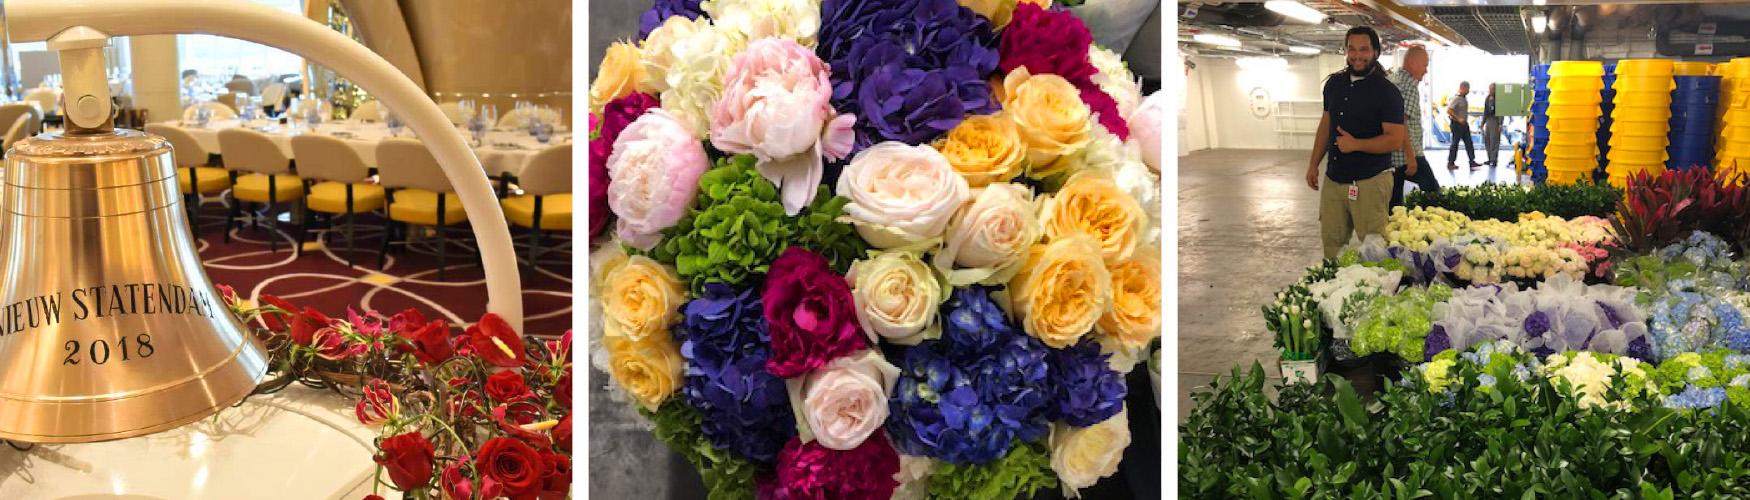 Cruise-Ship-Flowers-Oprah-Holland-America-2.jpg